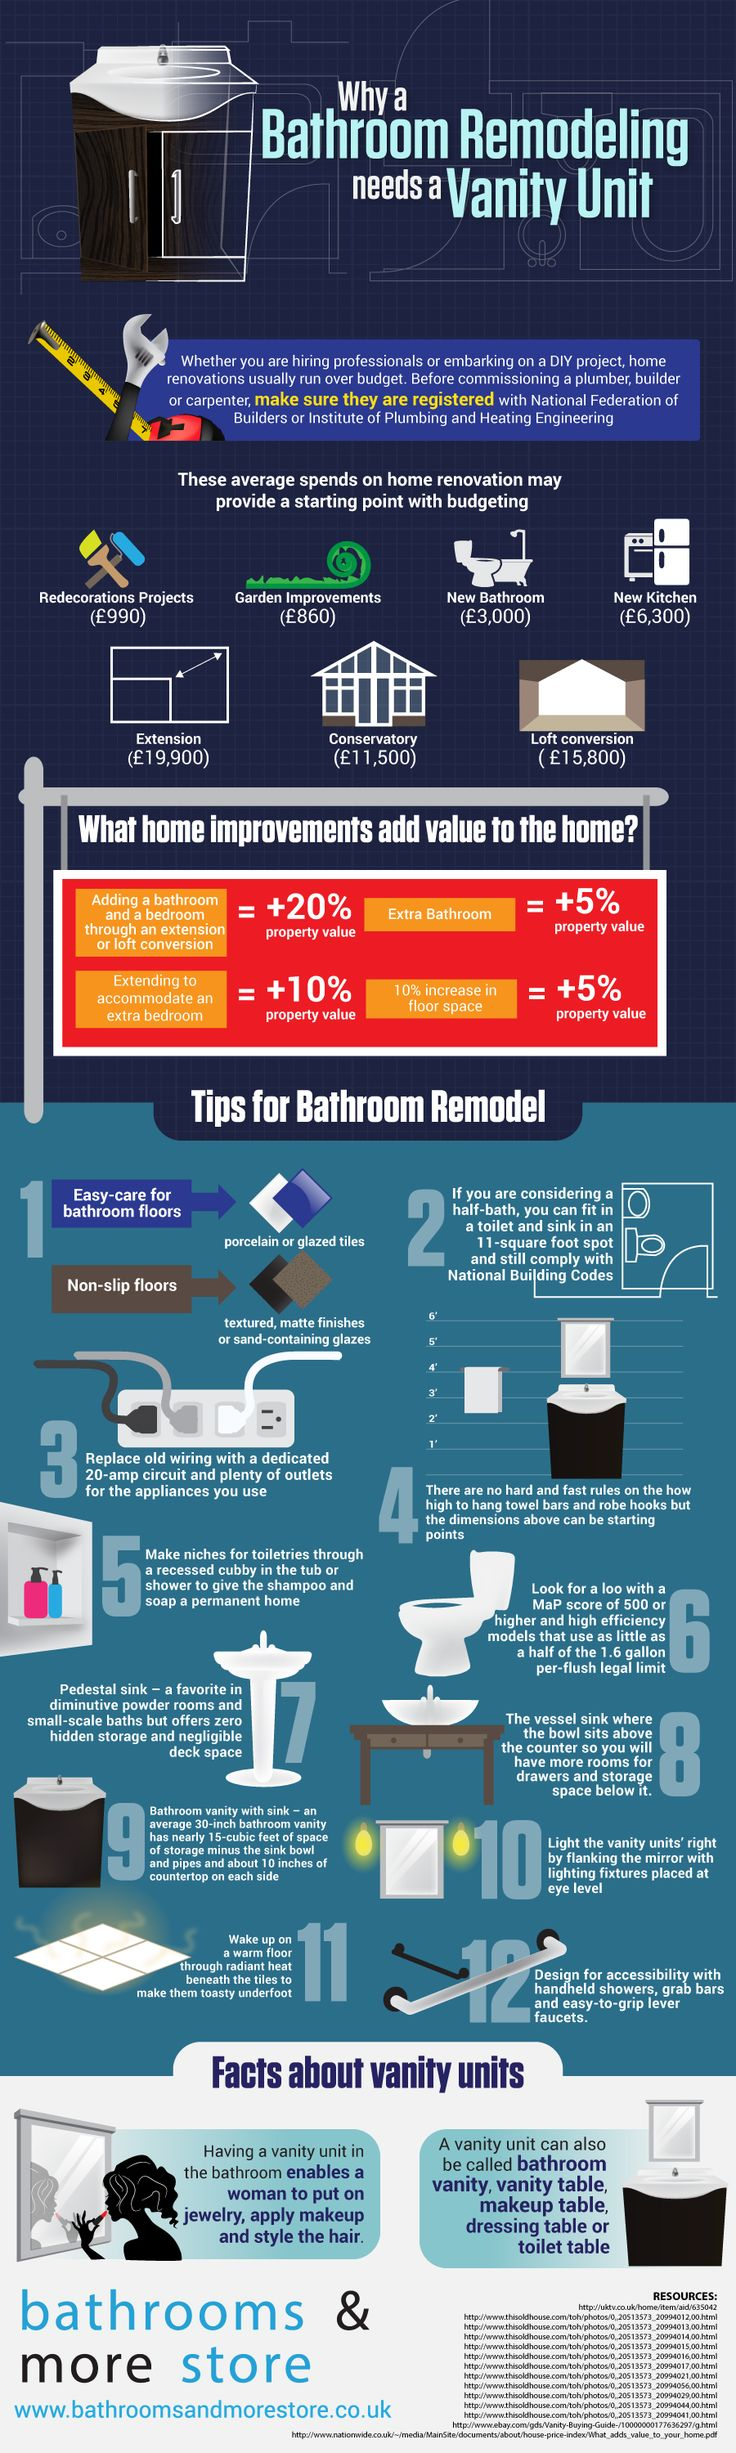 Best Bathroom Furniture Images Onbathroom